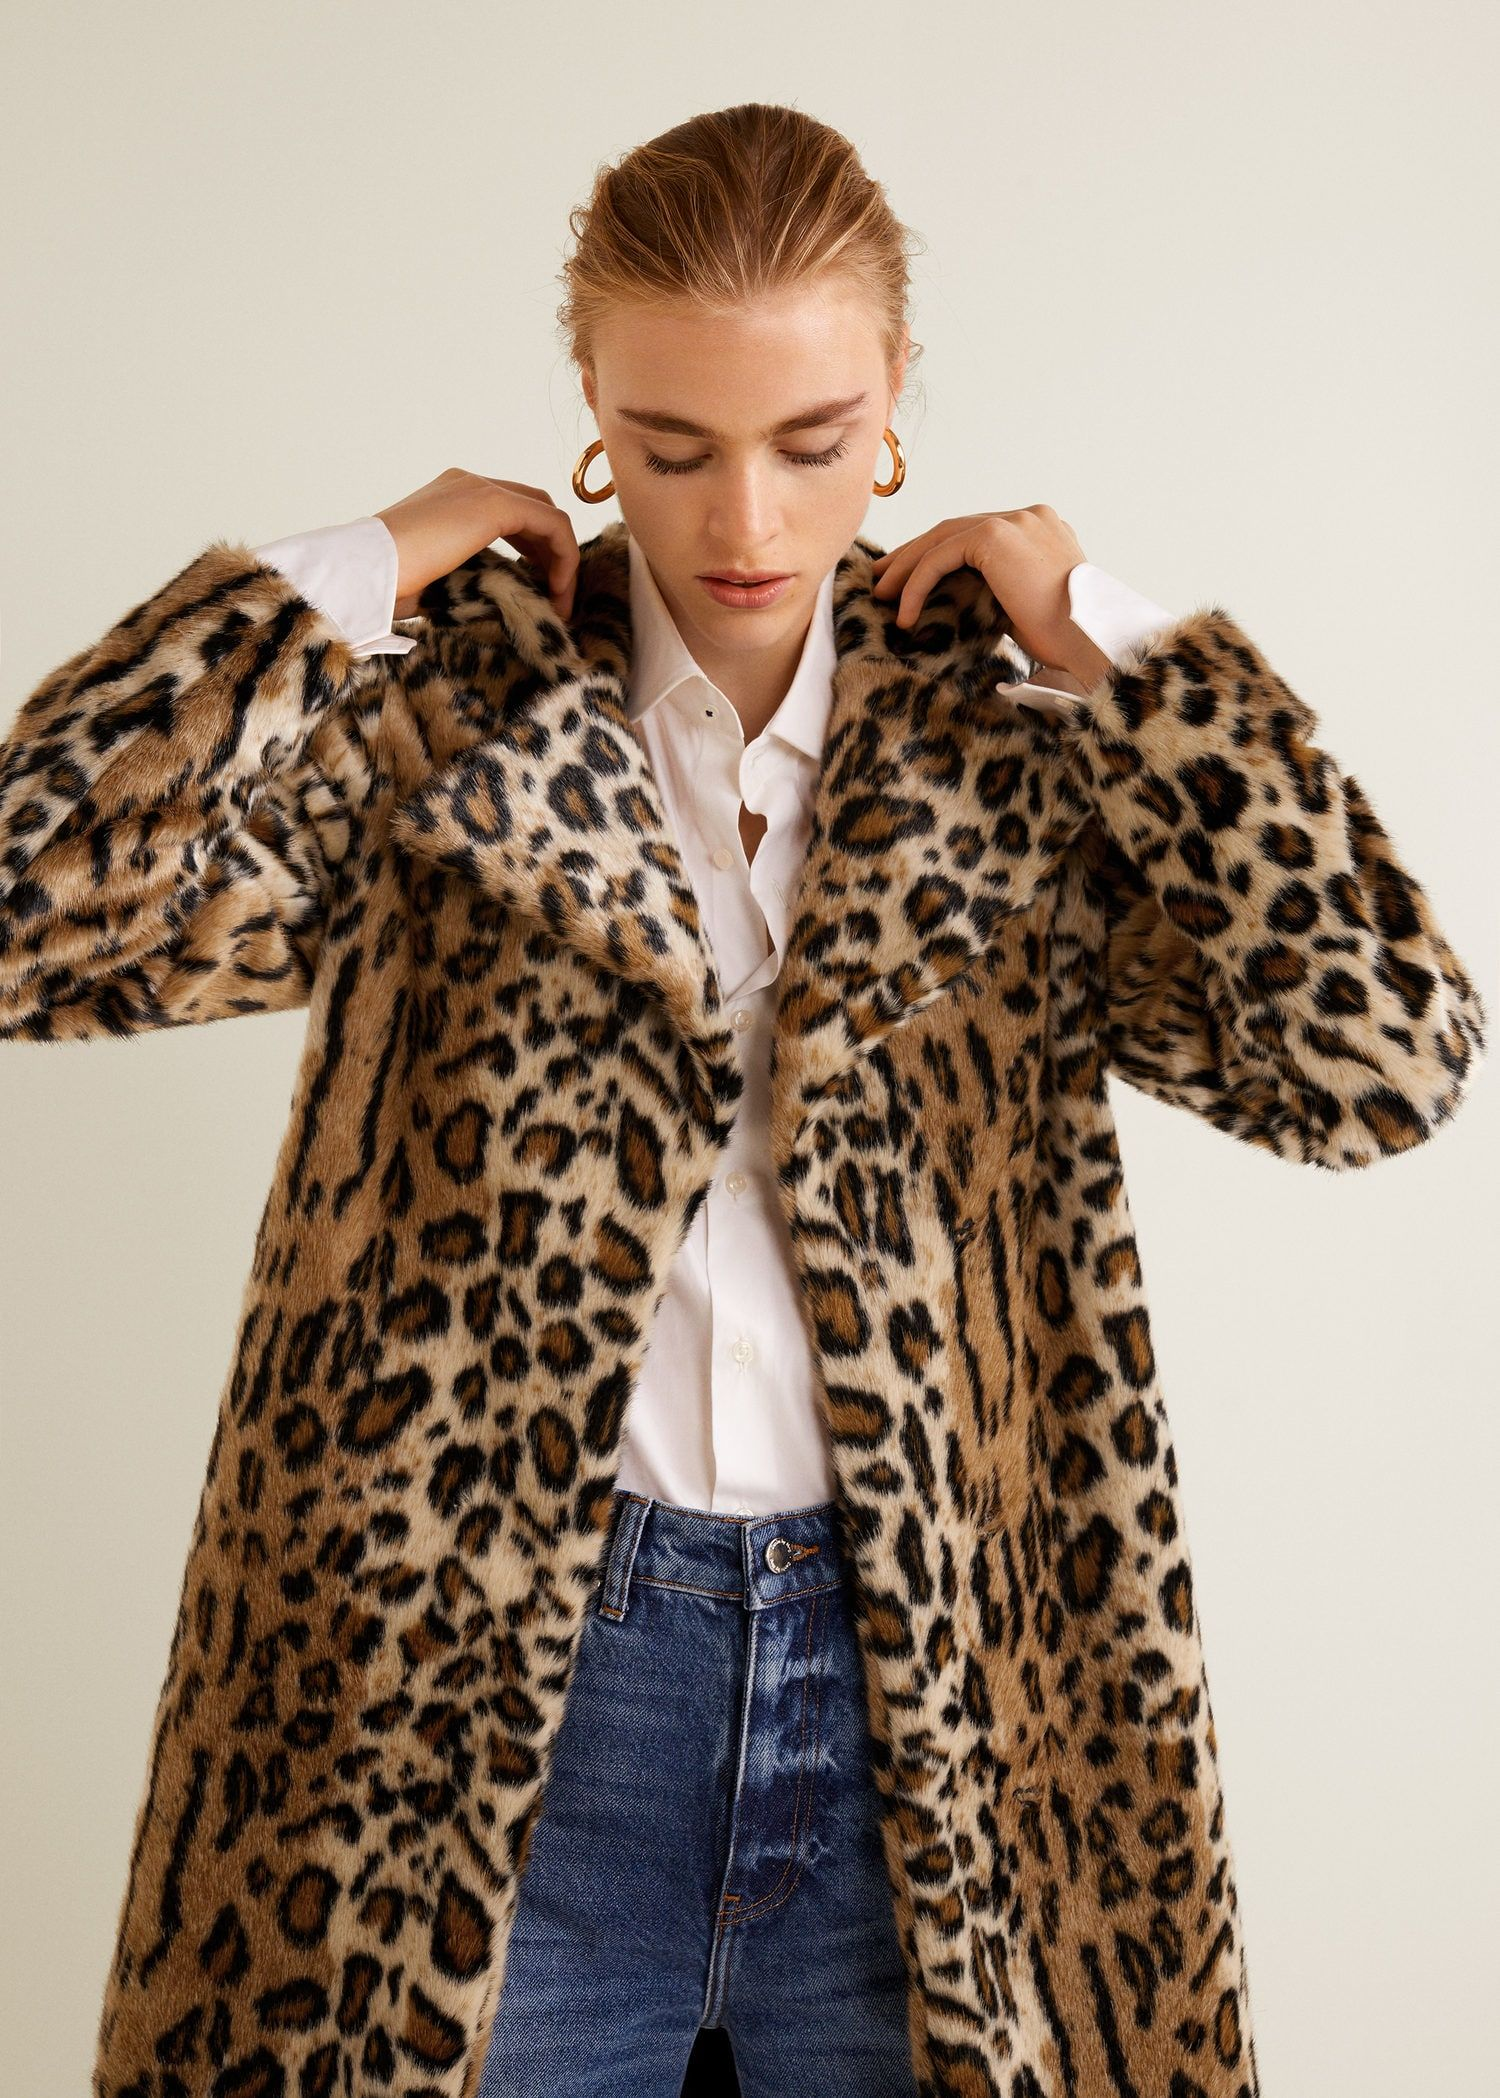 Womens Warm Leopard Print Lapel Faux Fur Short Coat Winter Parka Outerwear